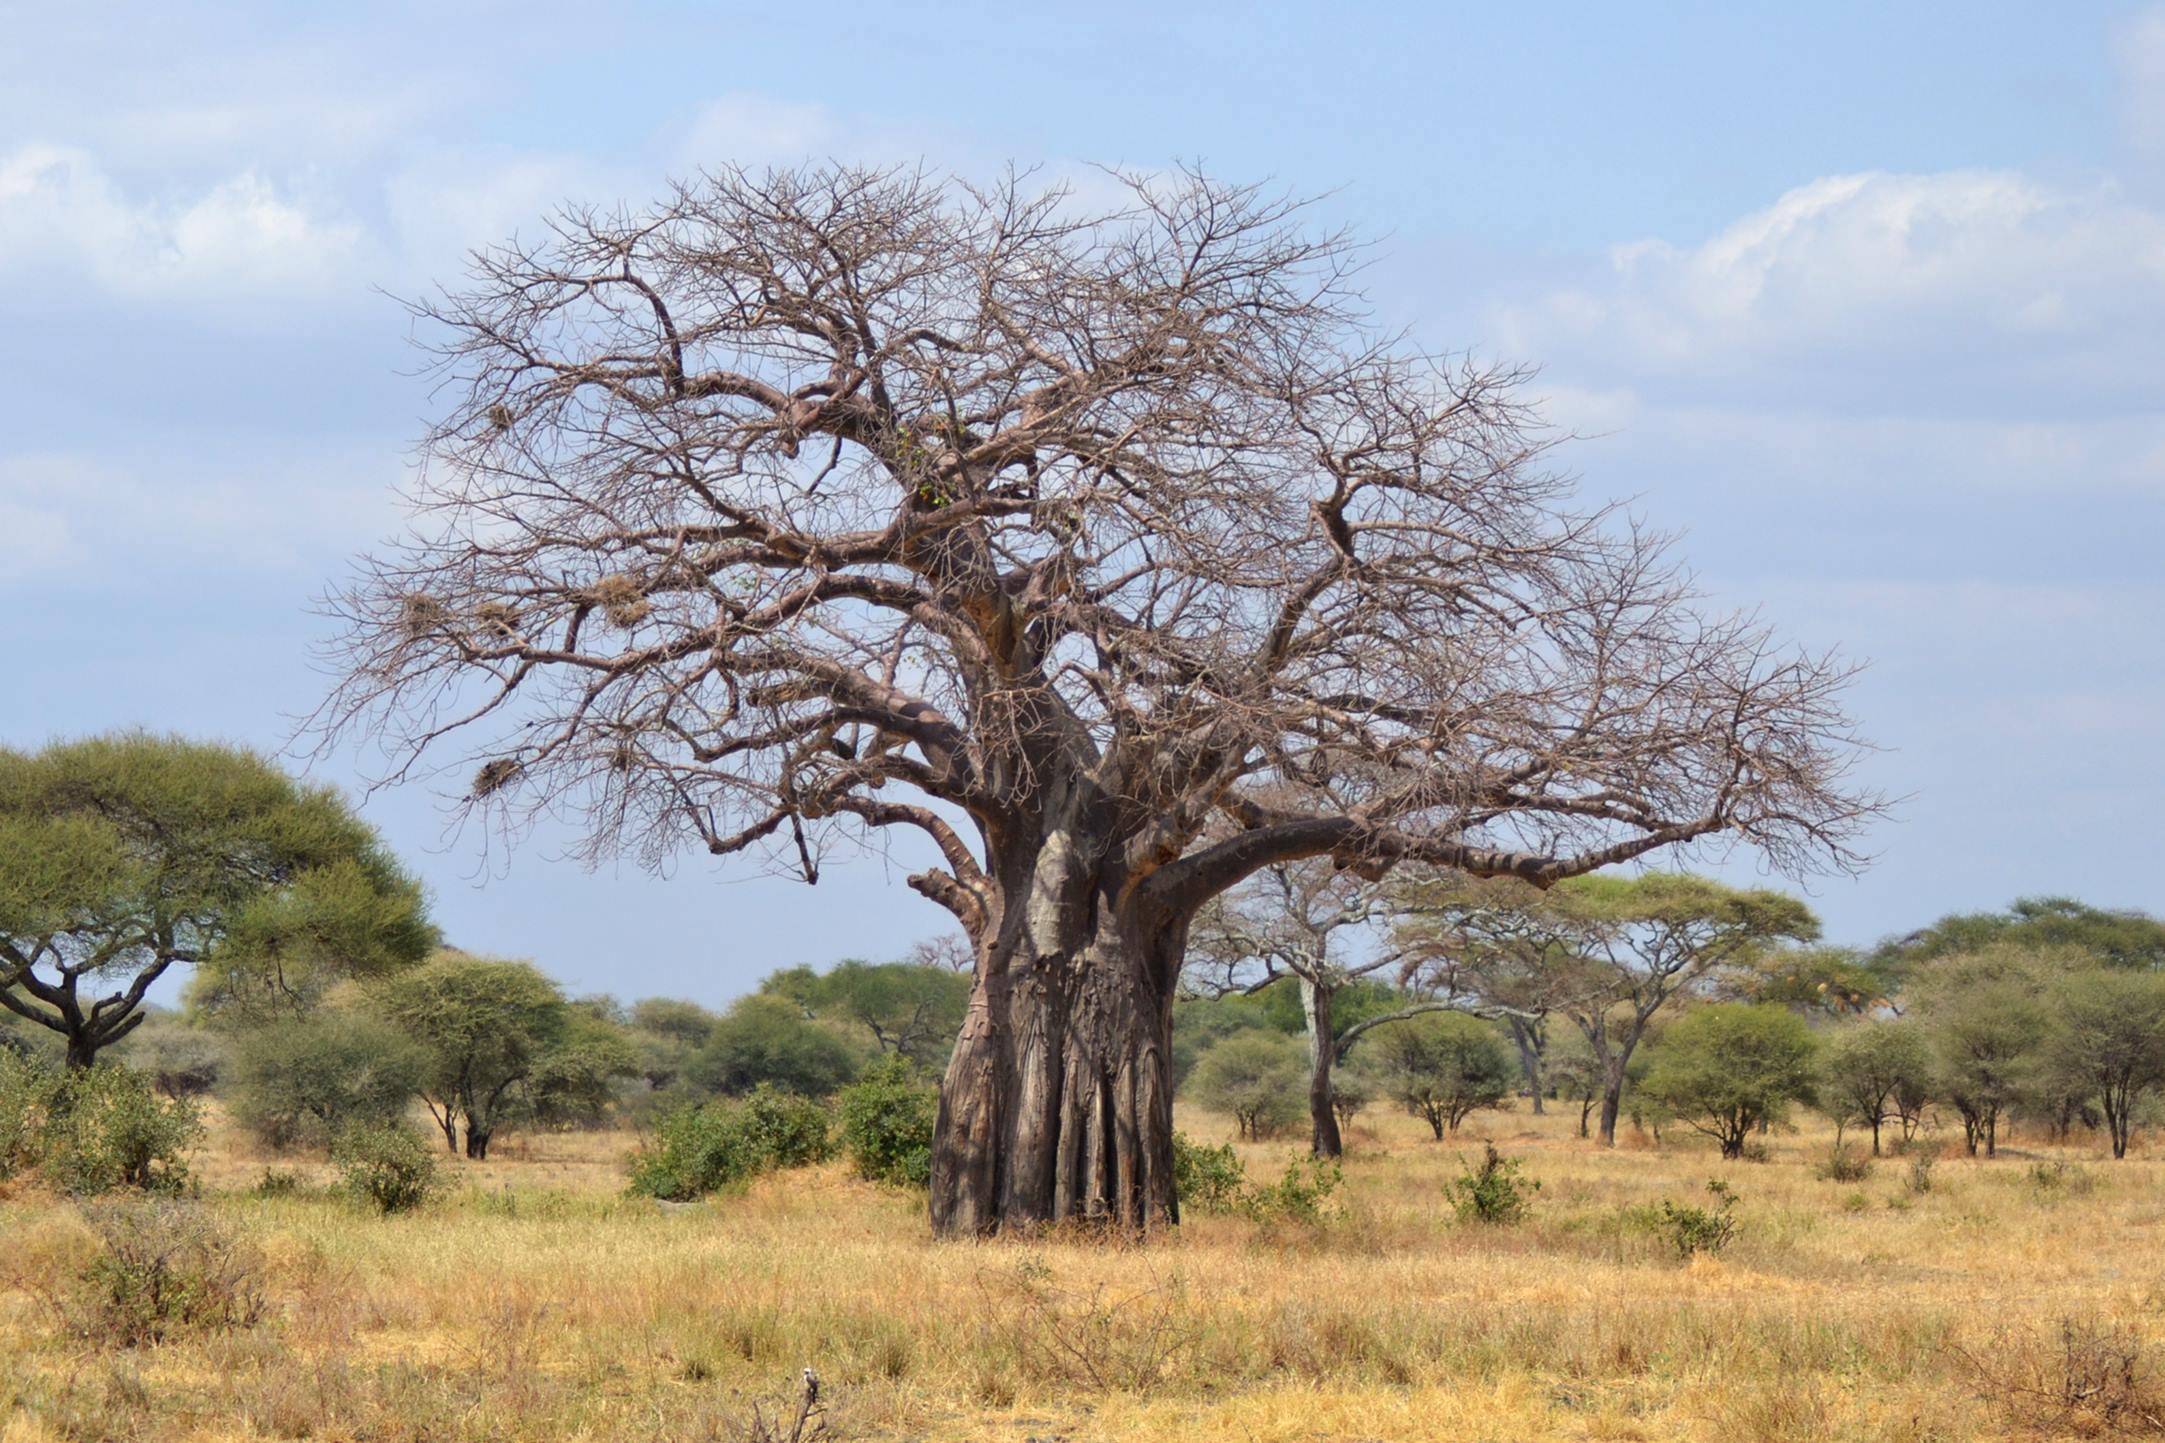 safari_tanzania_tarangire_2